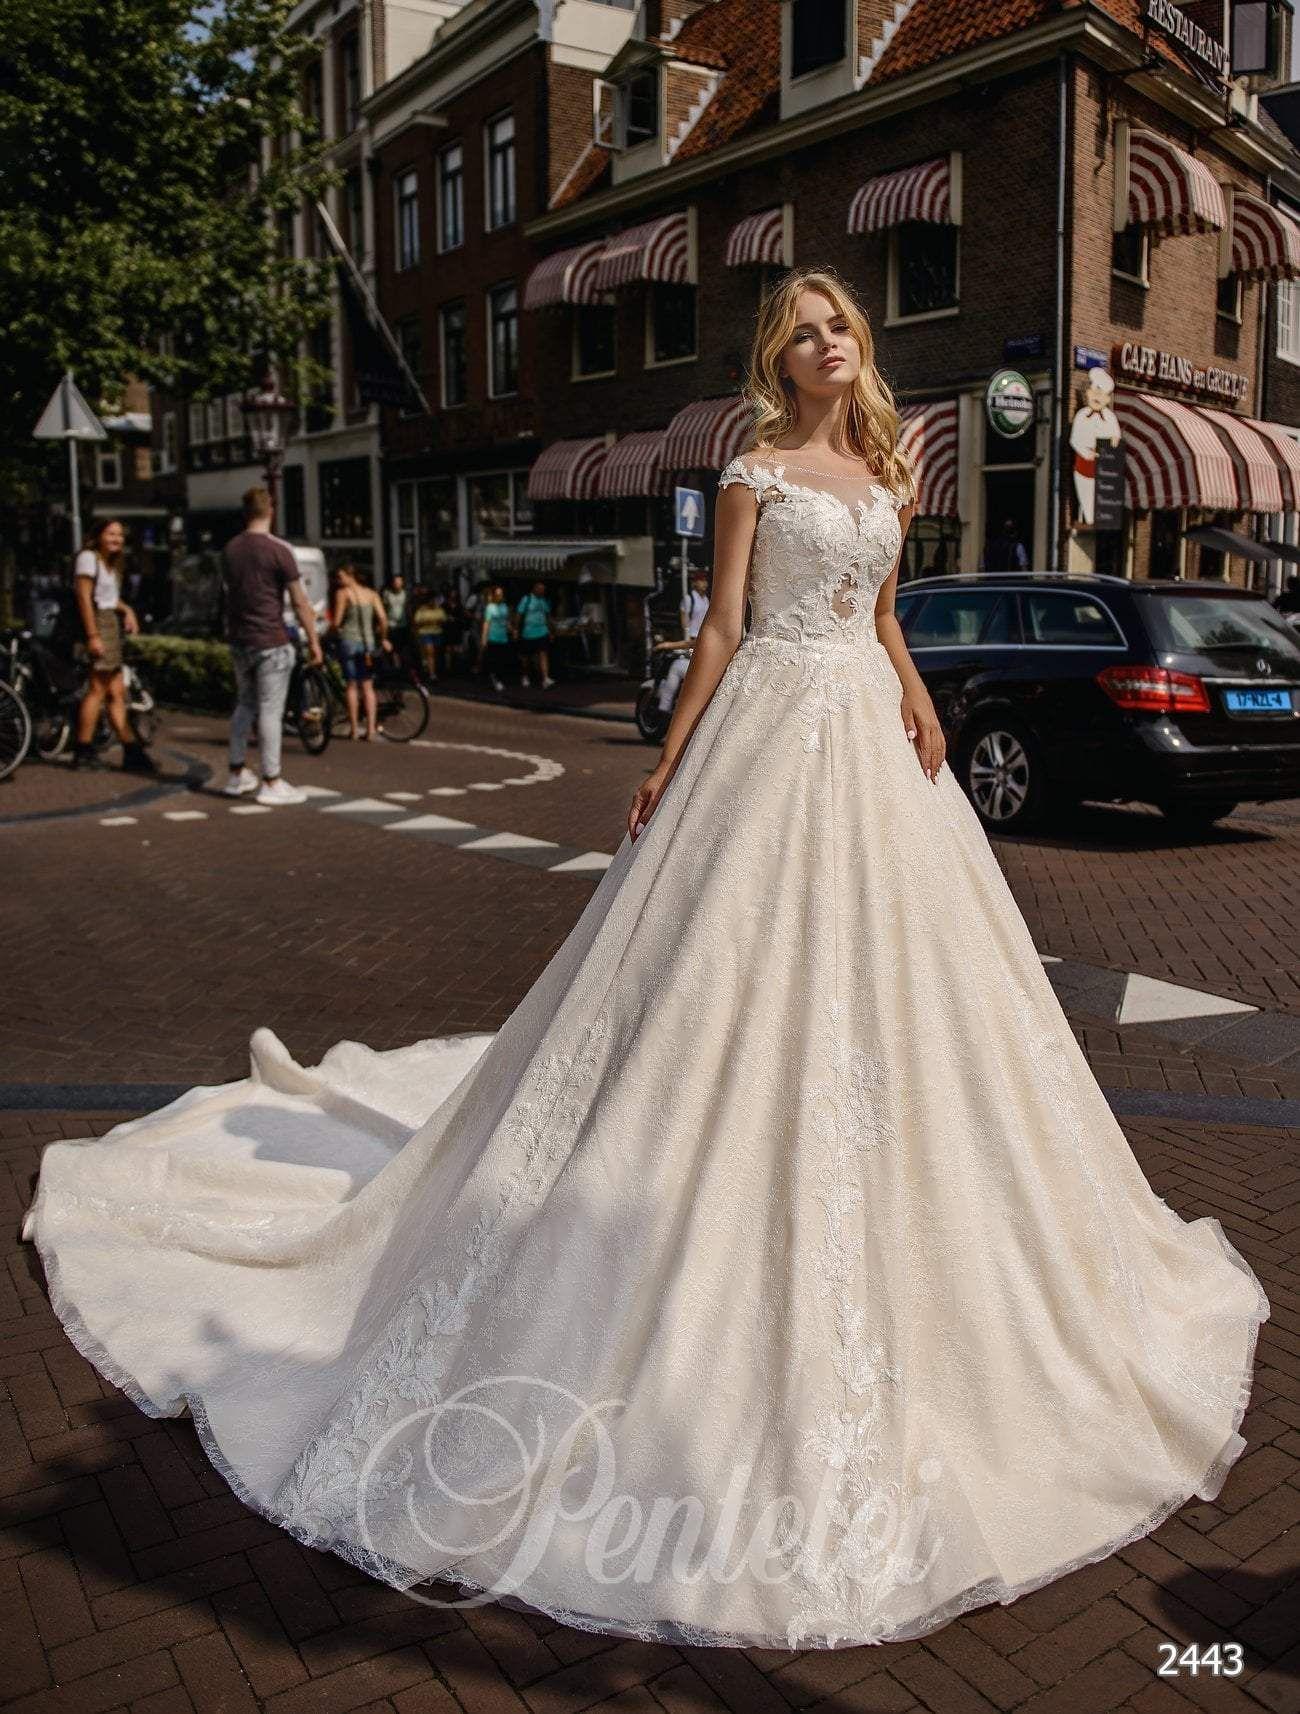 Imelda Chic Wedding Dresses Wholesale European Cocktail Gowns Bridal: Ever Buying Wholesale Wedding Dresses At Reisefeber.org